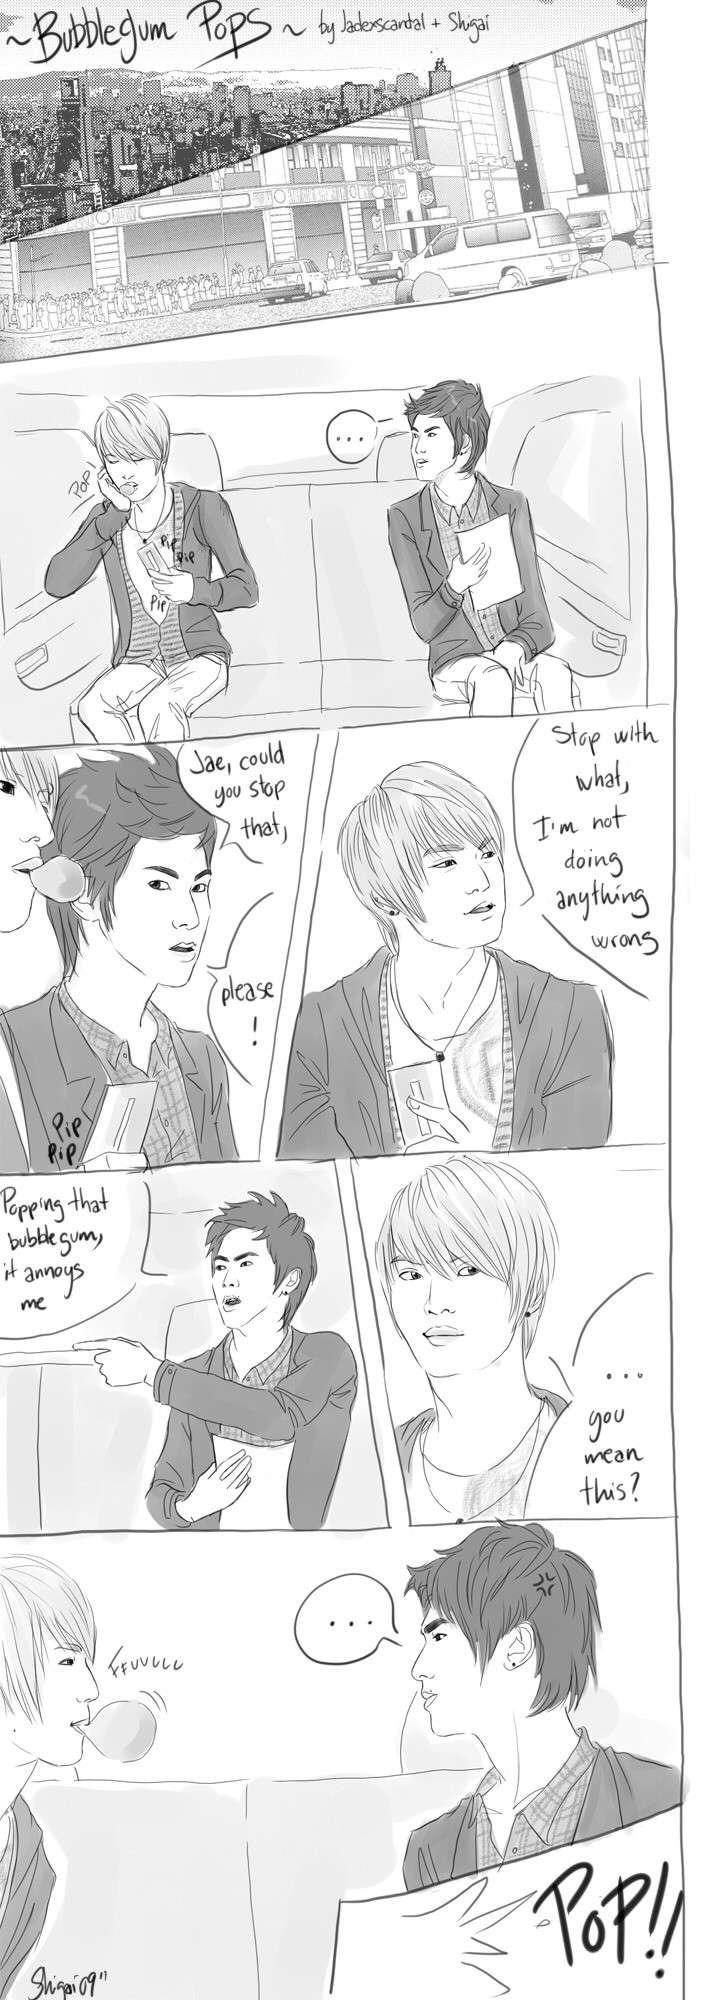 Yunjae komiks (Bubblegum Pops by Jadexscandal) Pops0110